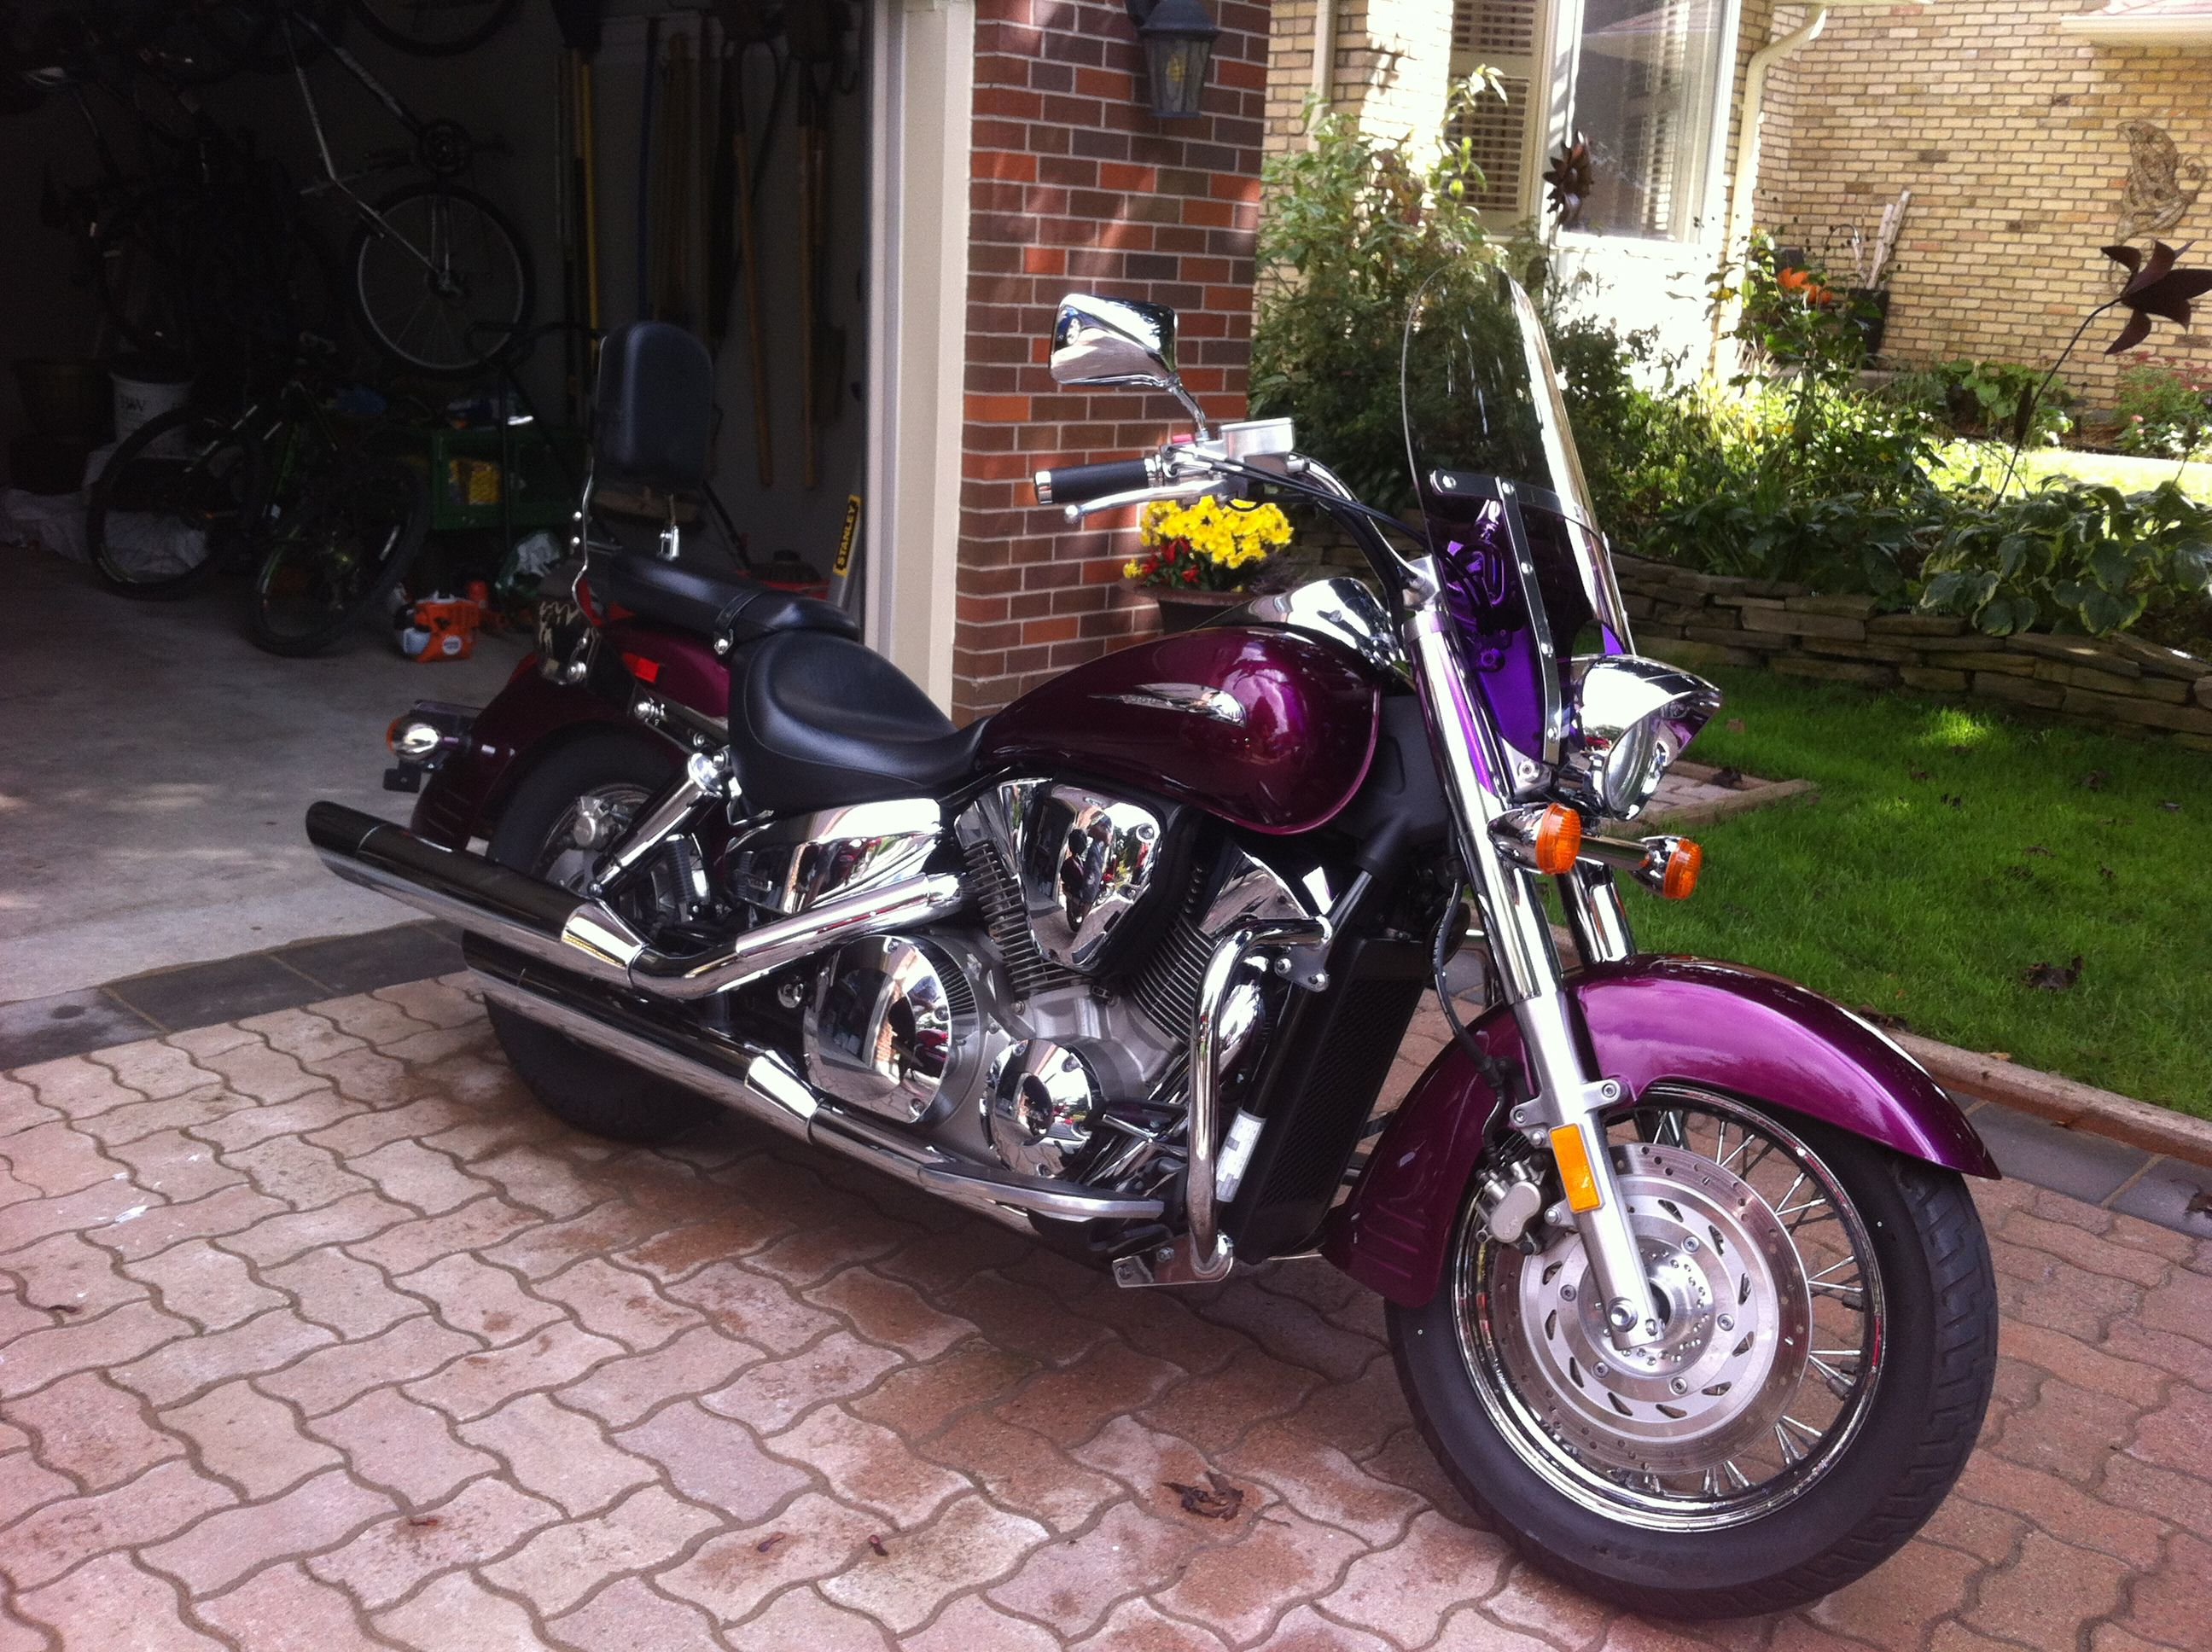 Dynamic New Moto Bike Motorcycle Motorbike Windshield Windscreen For Honda Shadow Ace Rs 750 Aero Spirit 1100 Windscreens & Wind Deflectors